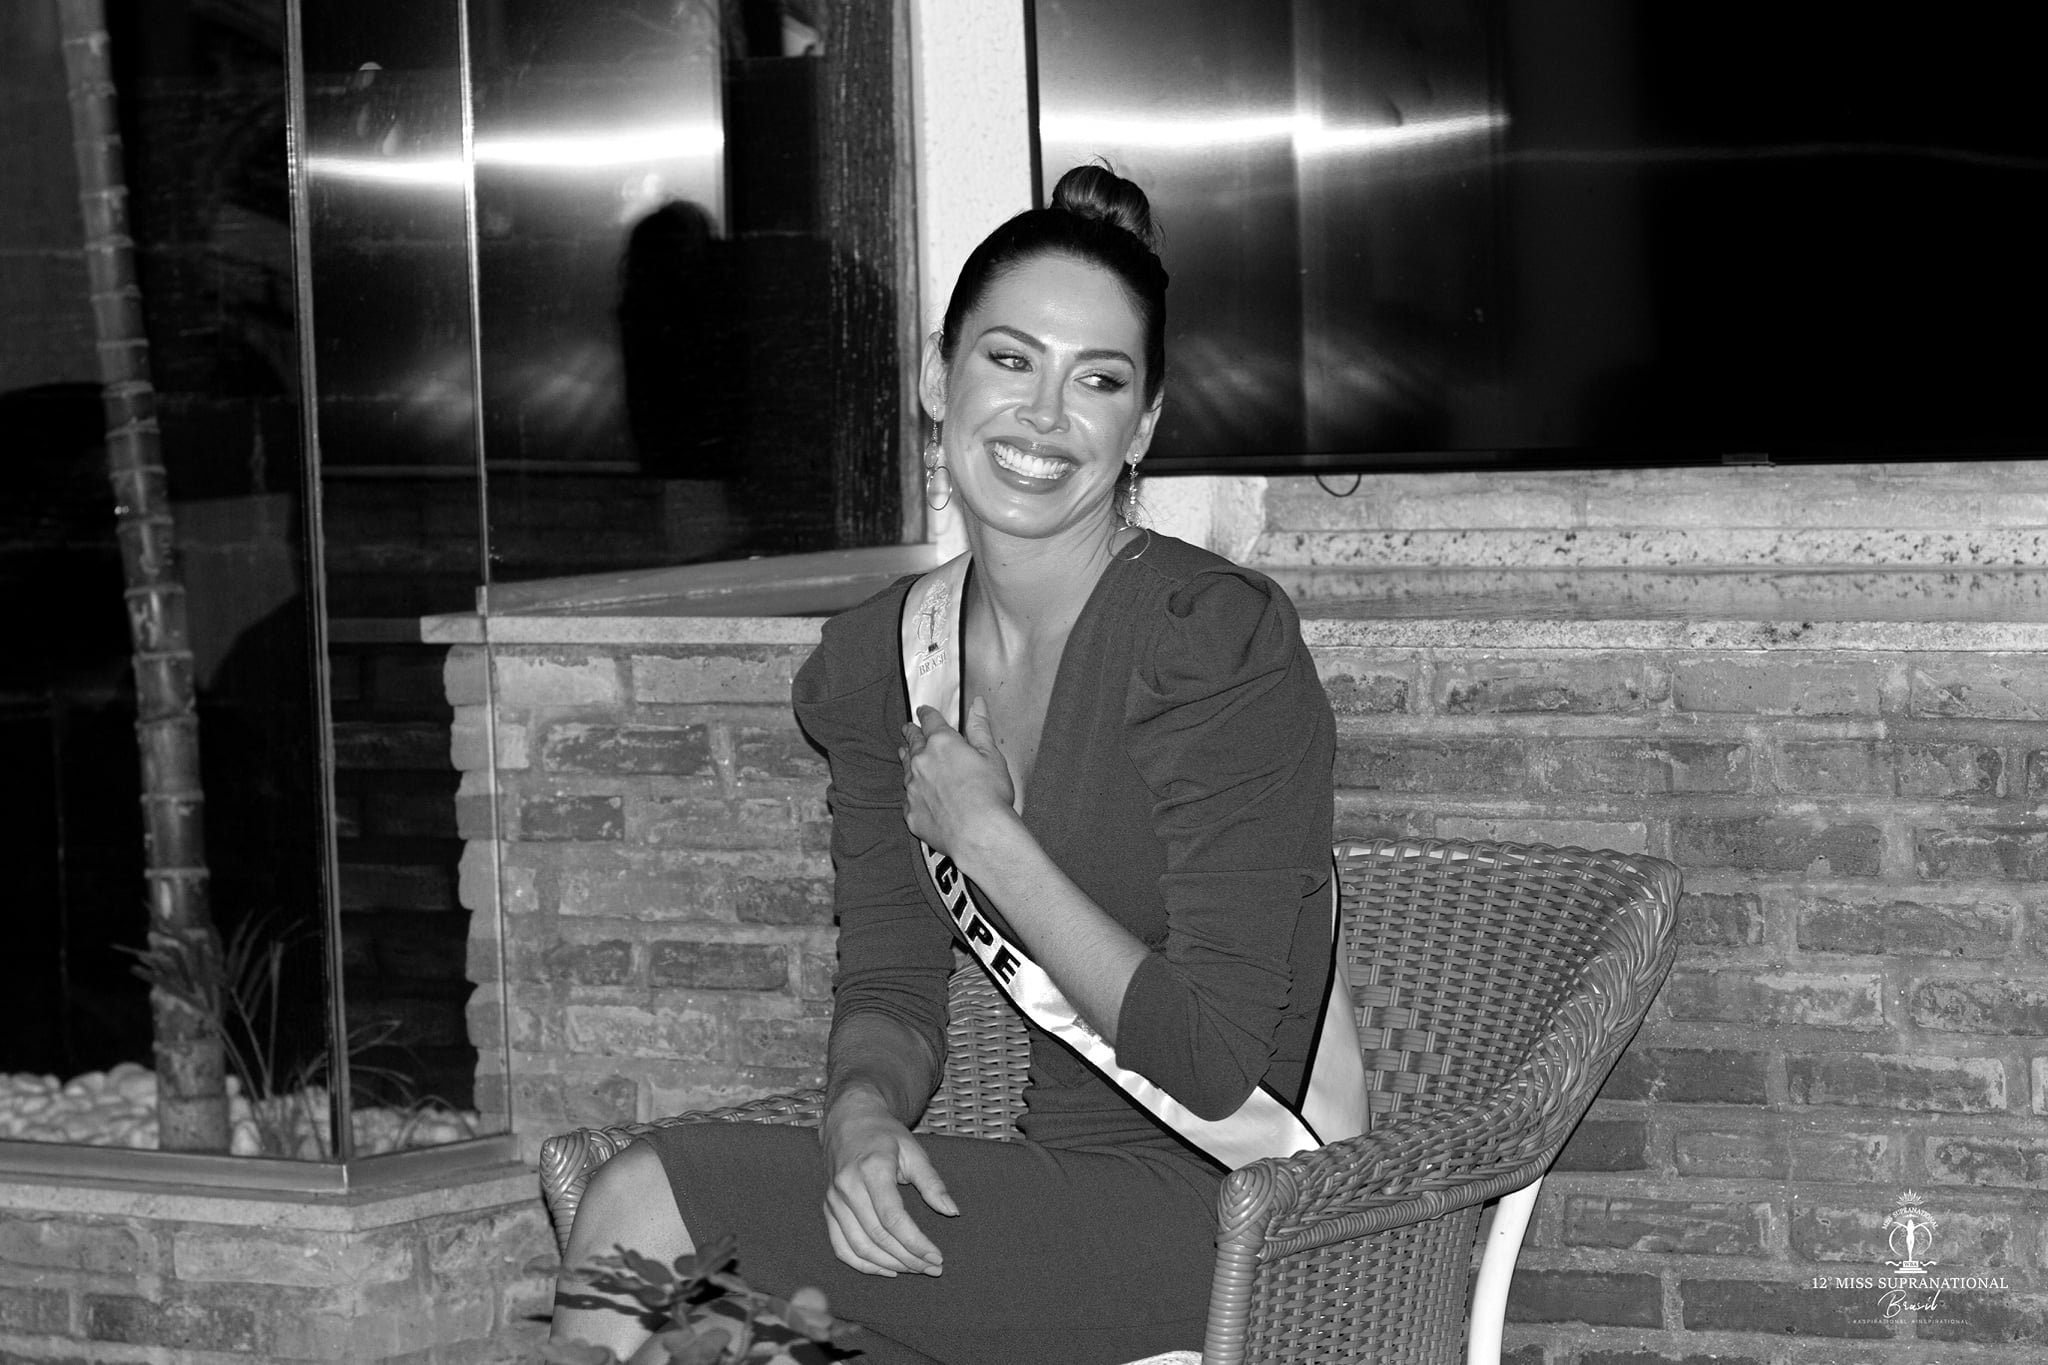 bruna zanardo, 1st runner-up de miss supranational brazil 2020/miss brasil internacional 2017/miss brasil terra 2016. - Página 17 12765511